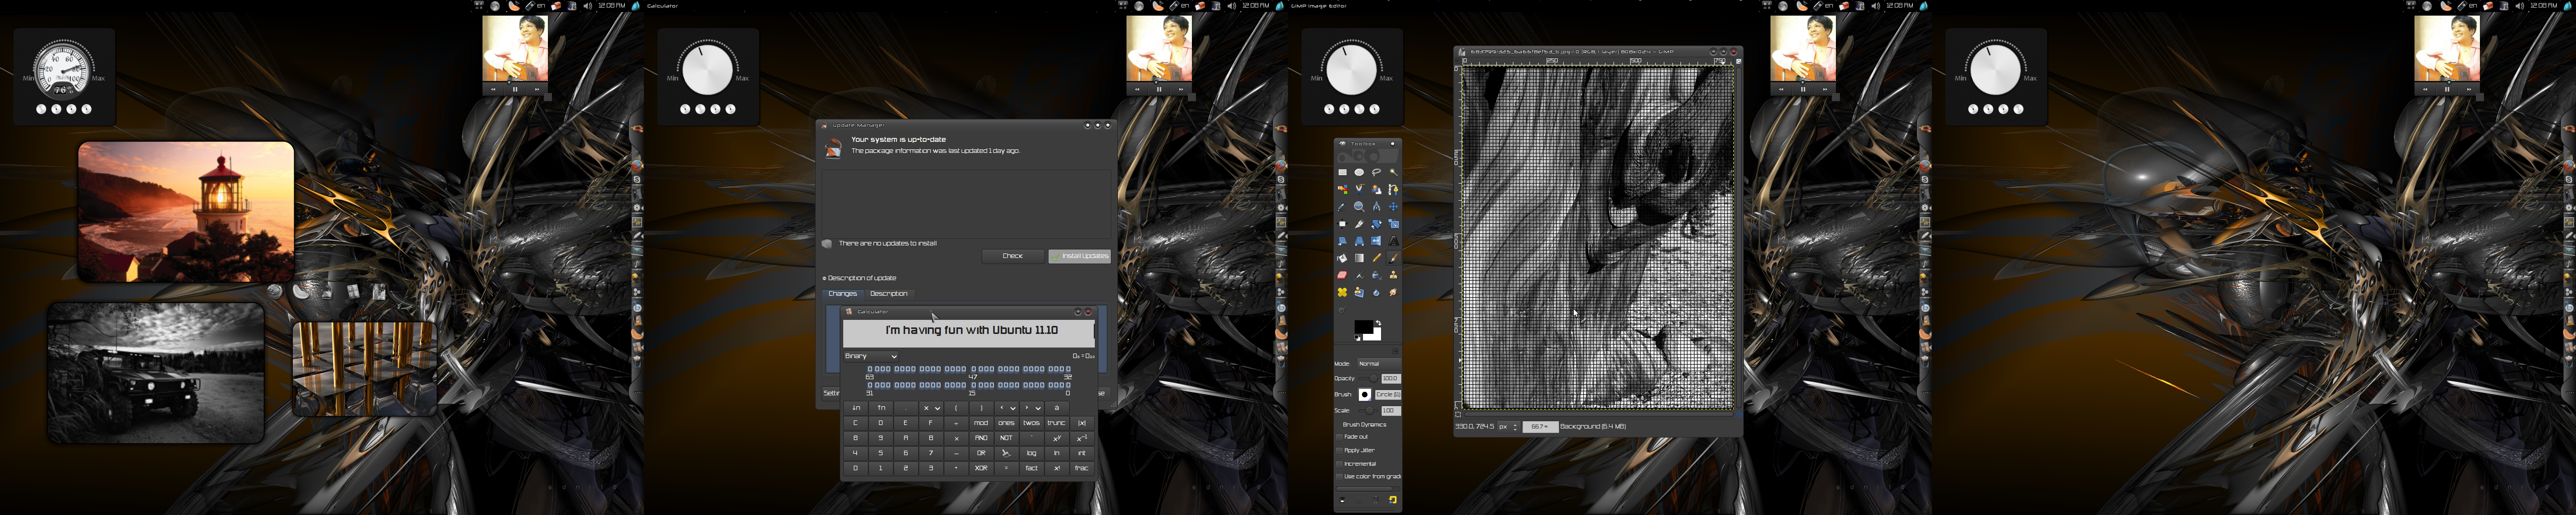 Beginning to Have Fun _ Ubuntu Oneiric by Paz-1